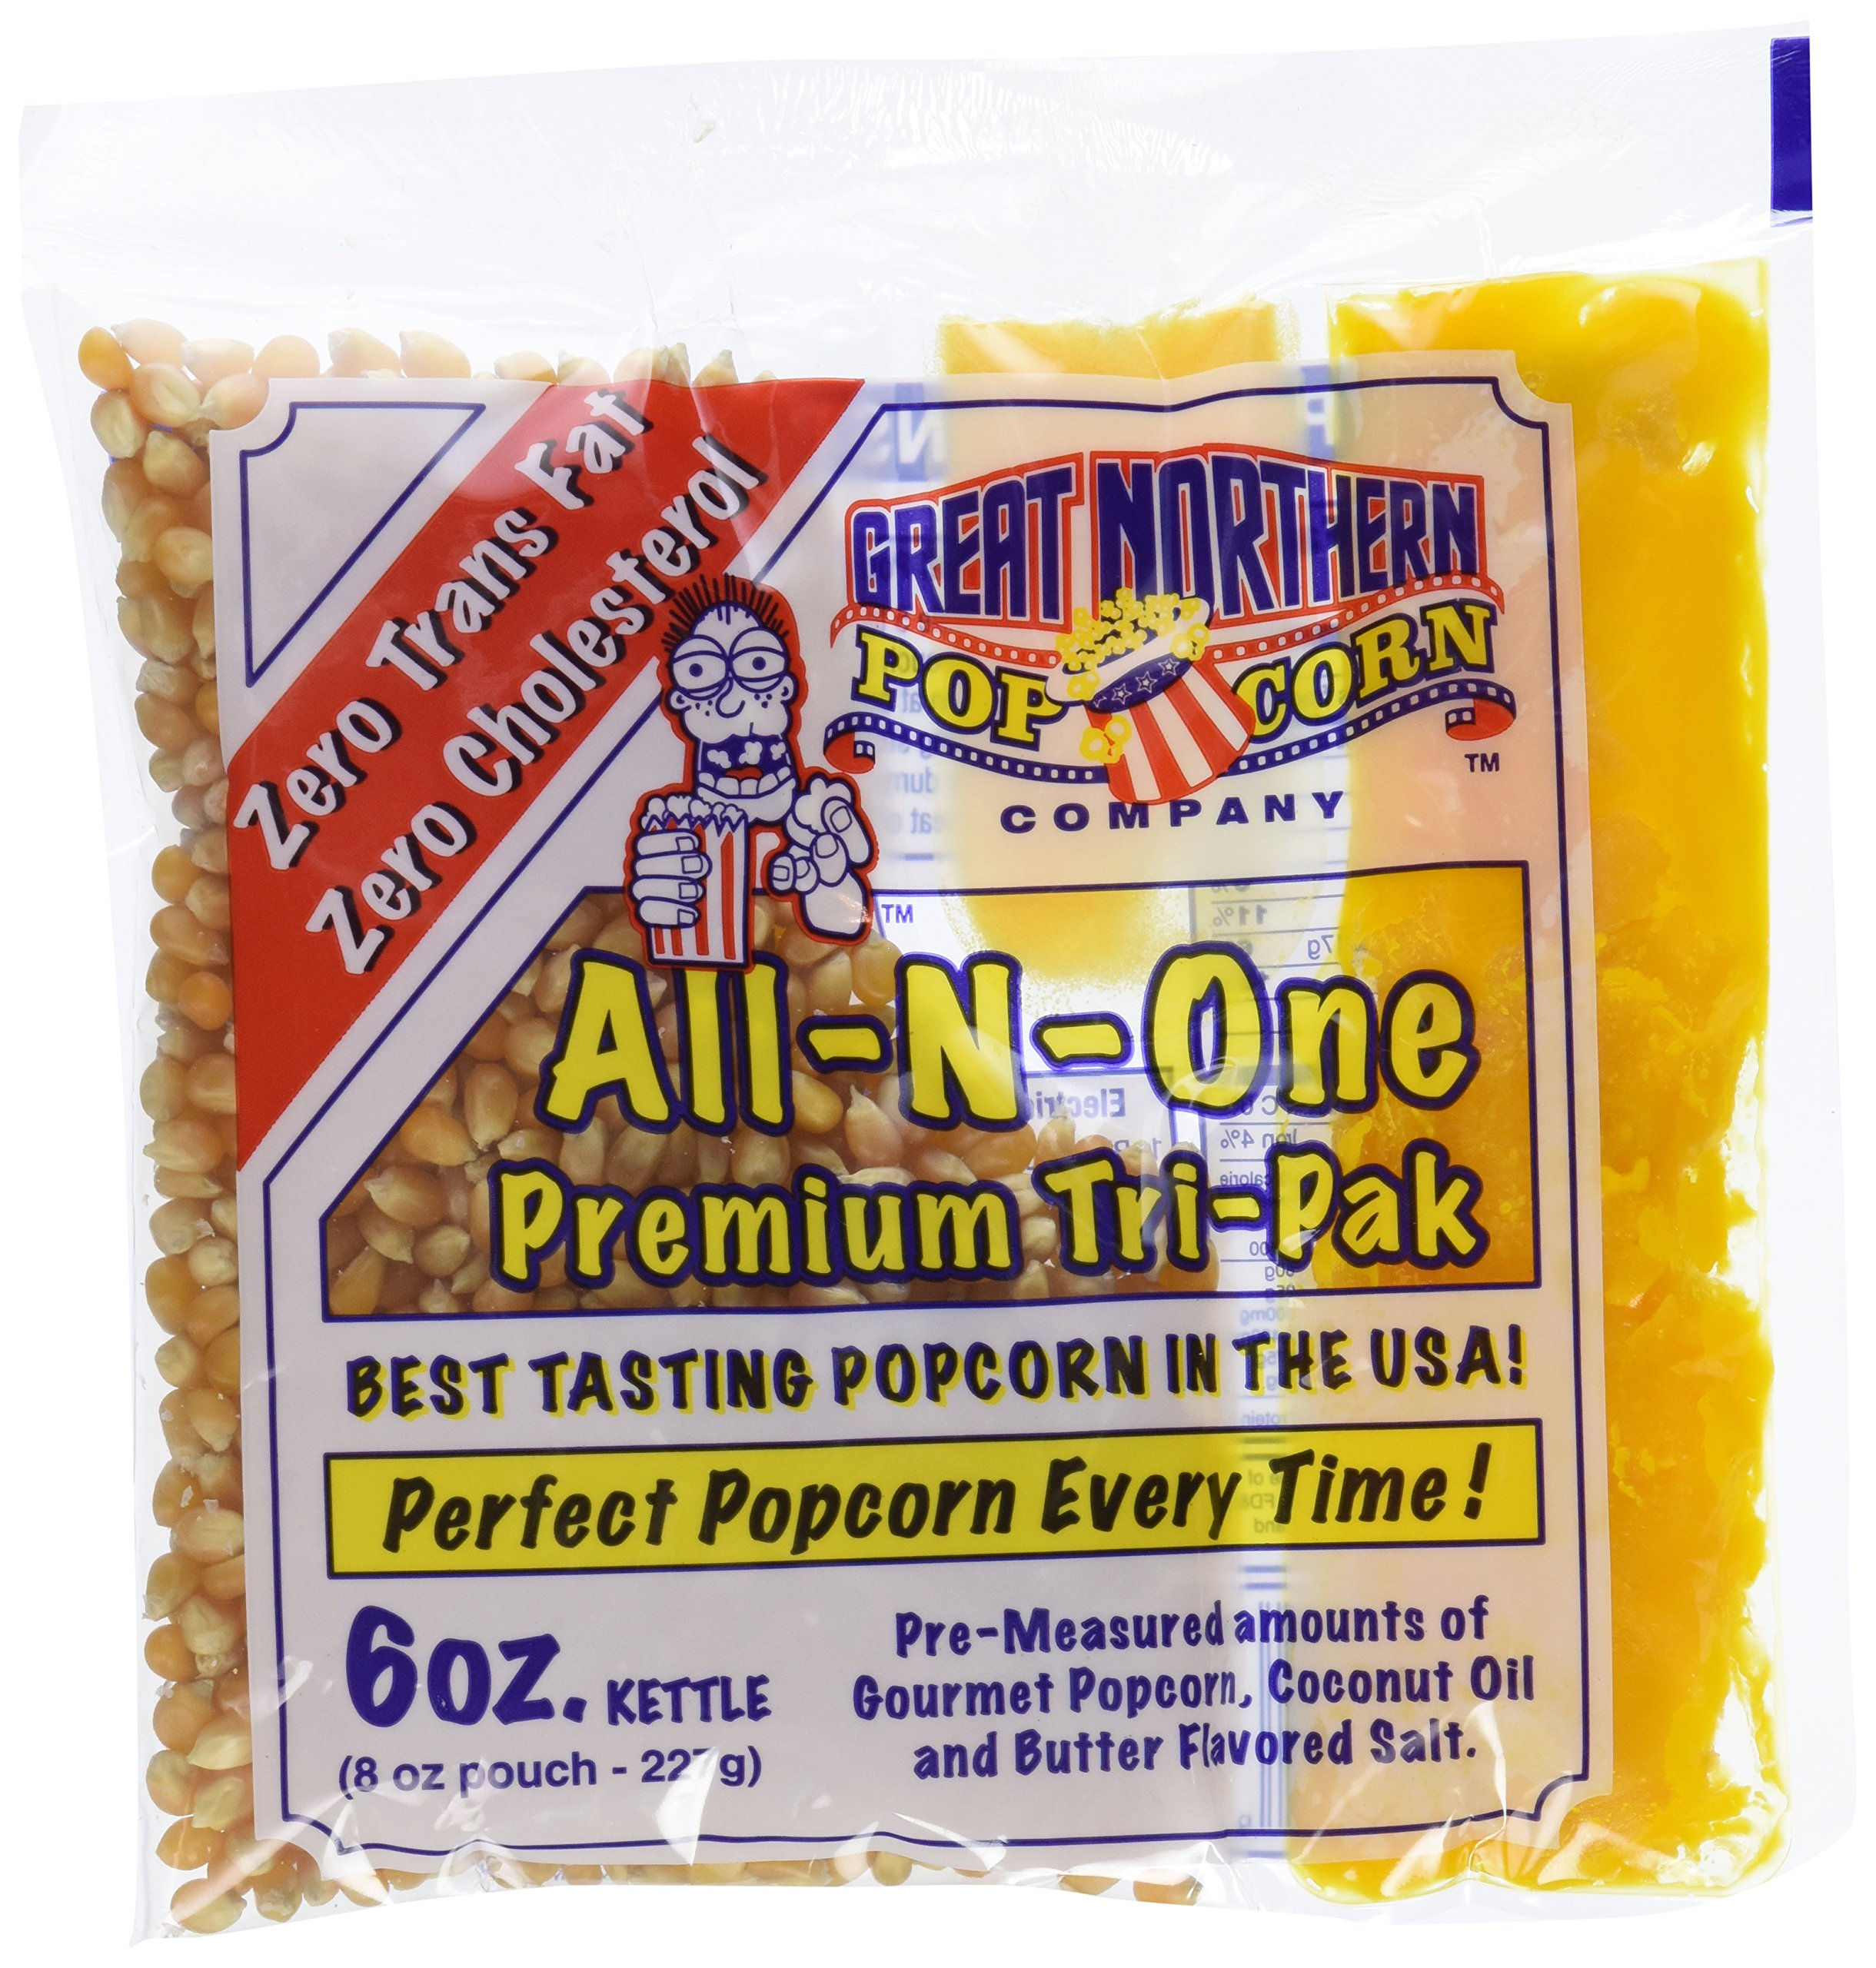 4067 Great Northern Popcorn 1 Case (12) of 6 Ounce Popcorn Portion Packs Kit Cinema by Great Northern Popcorn Company